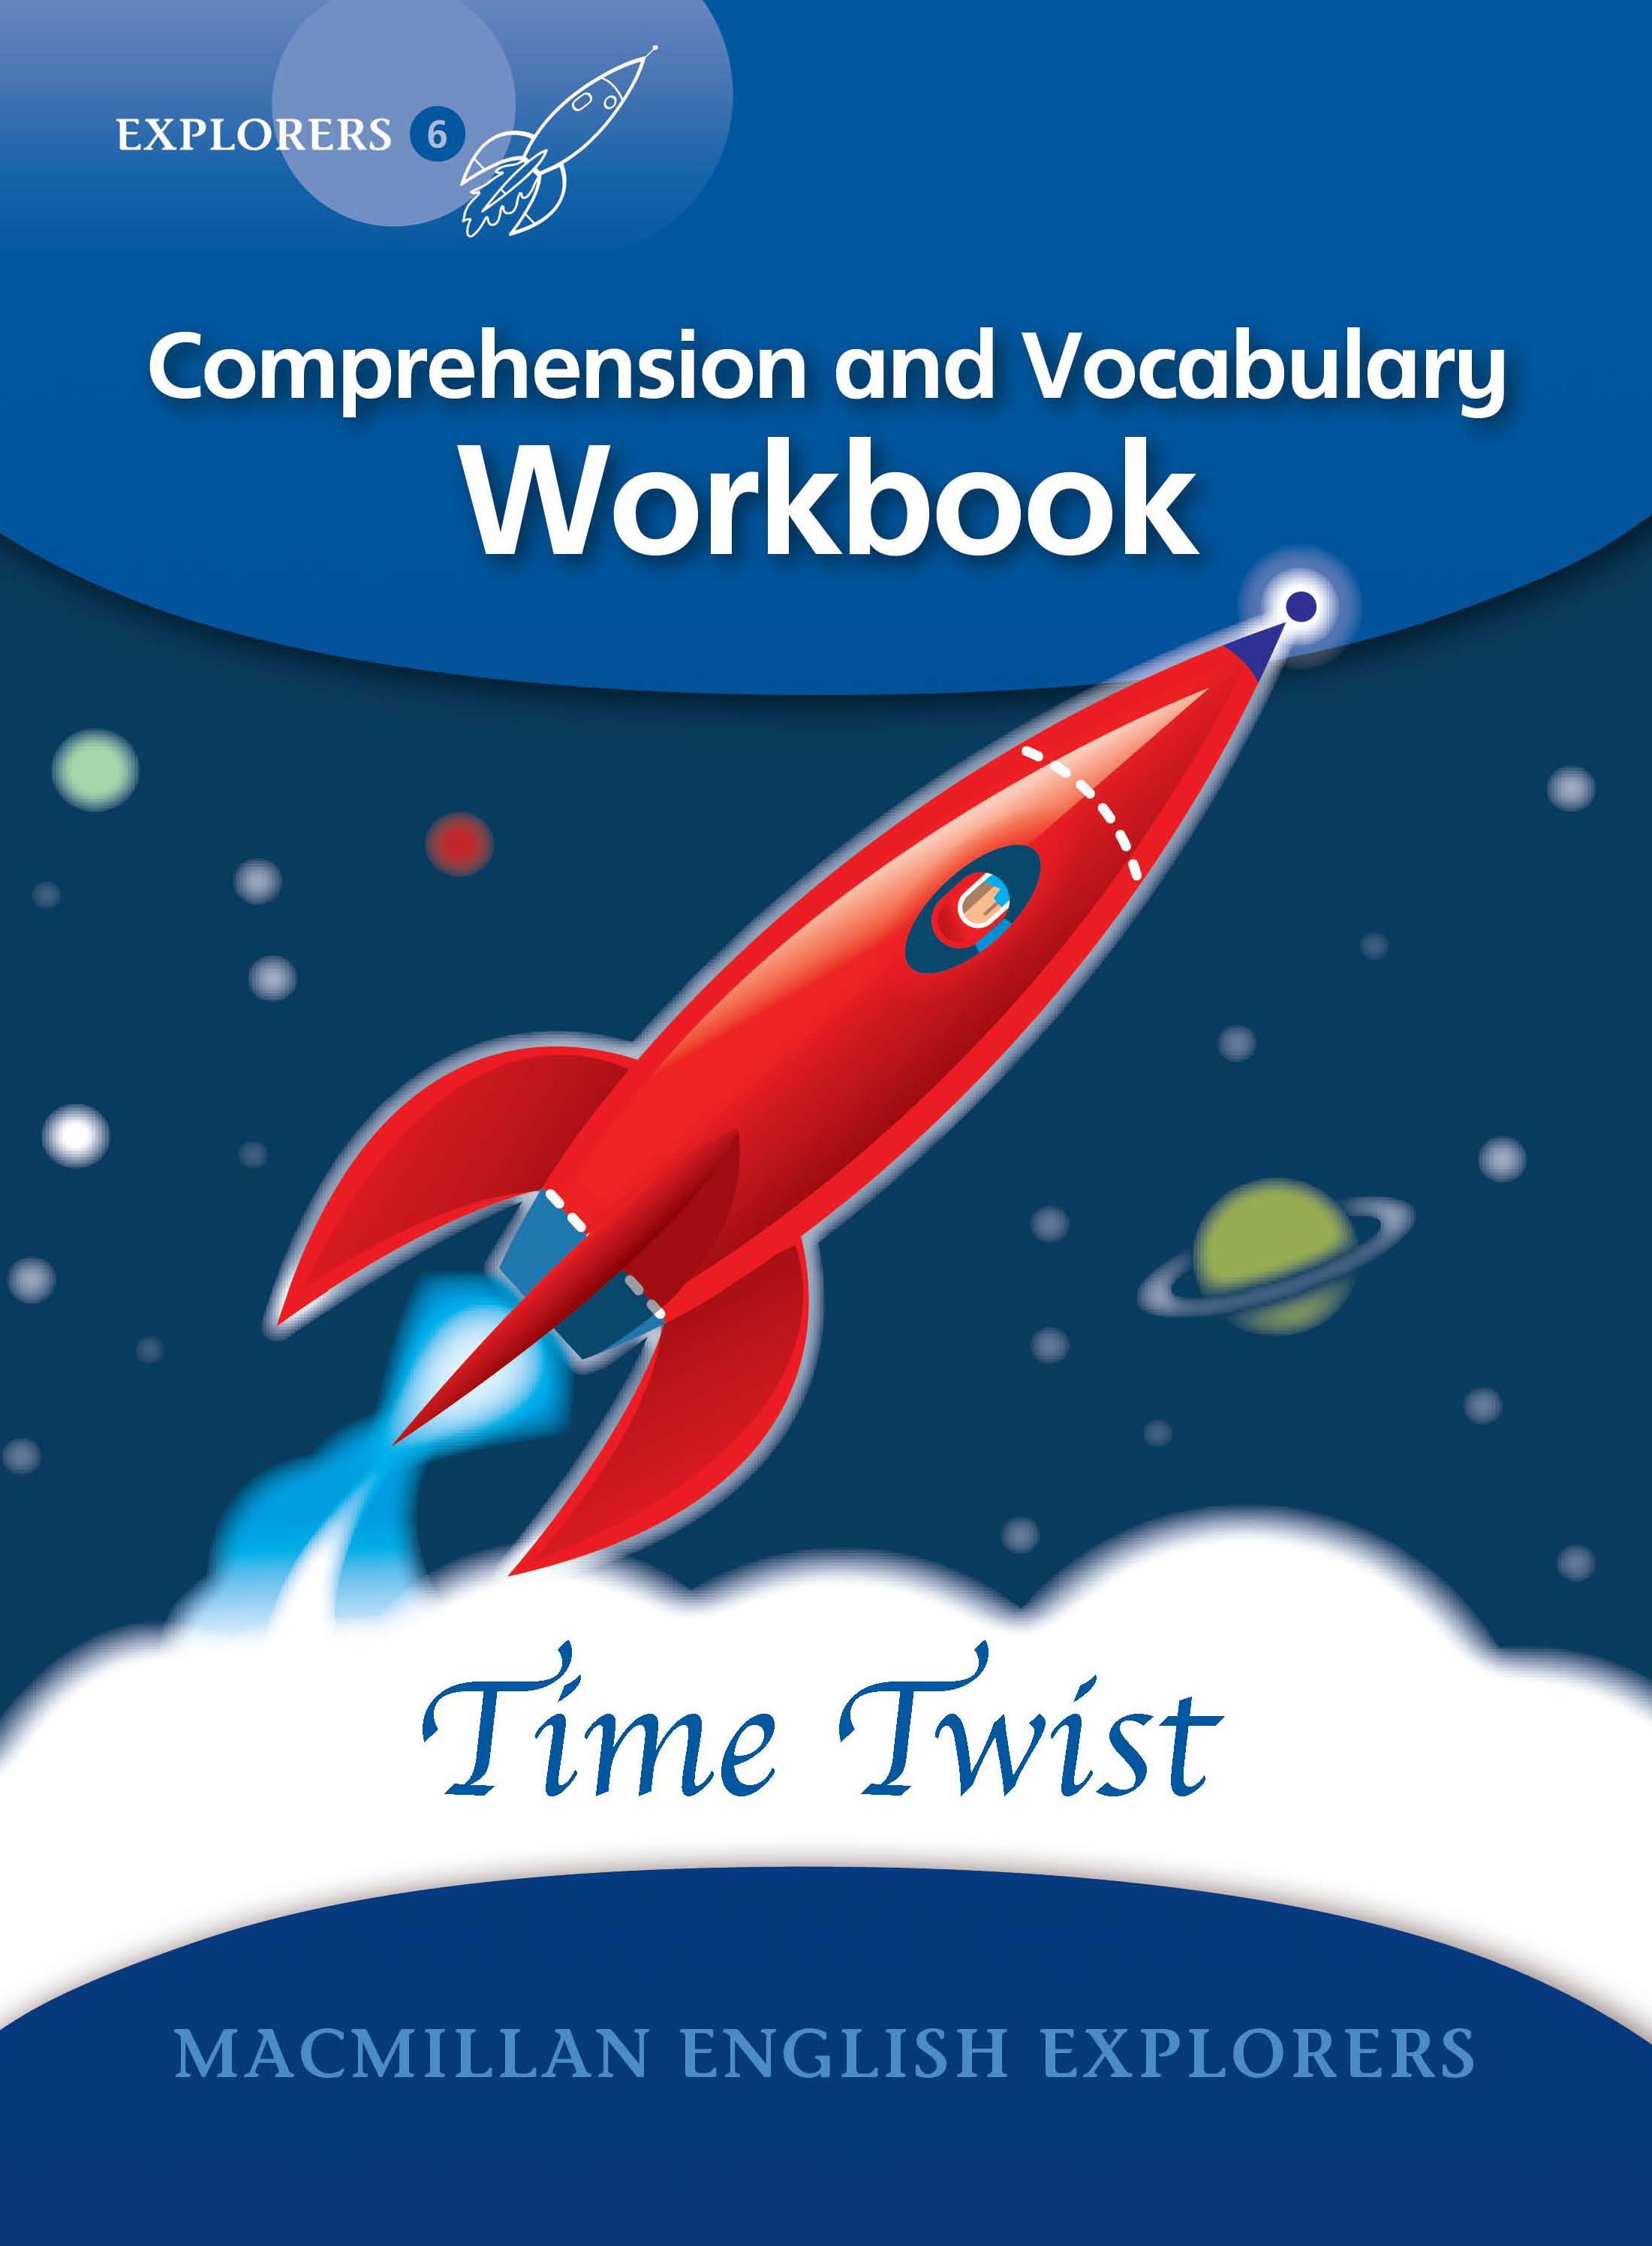 Explorers 6: Time Twist Workbook